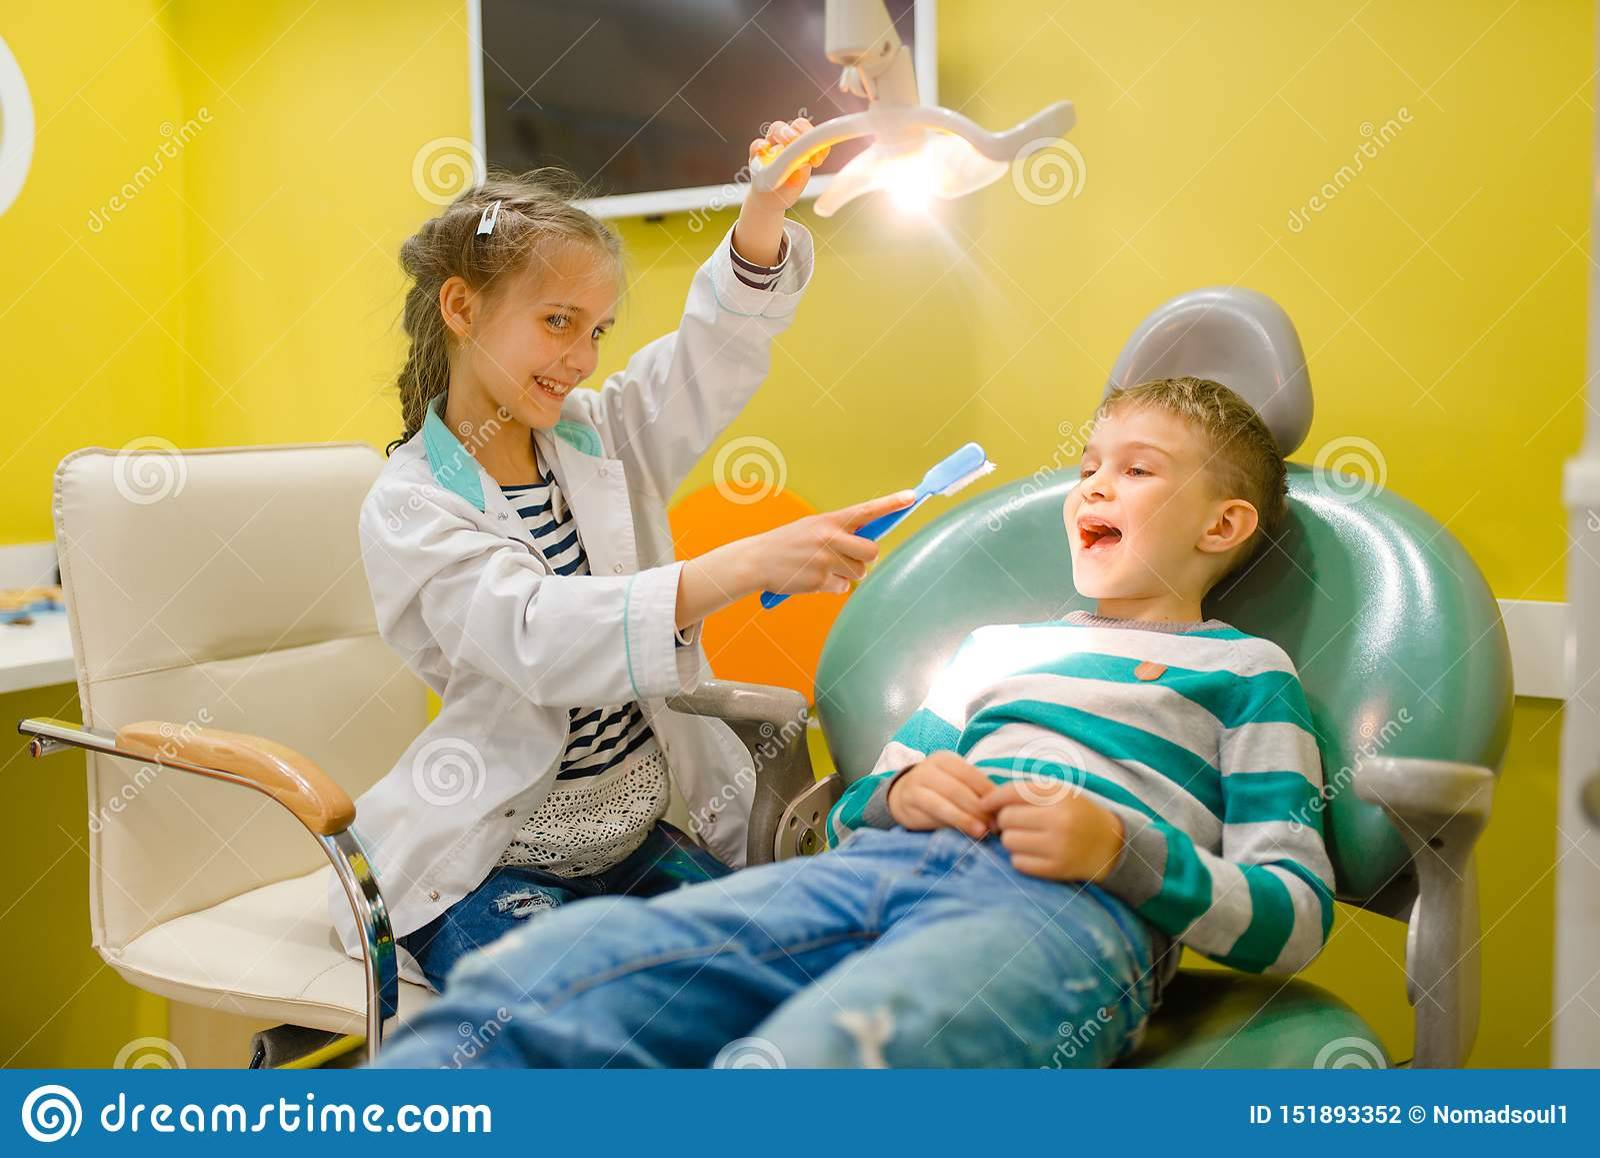 Little girl in uniform playing dentist, playroom